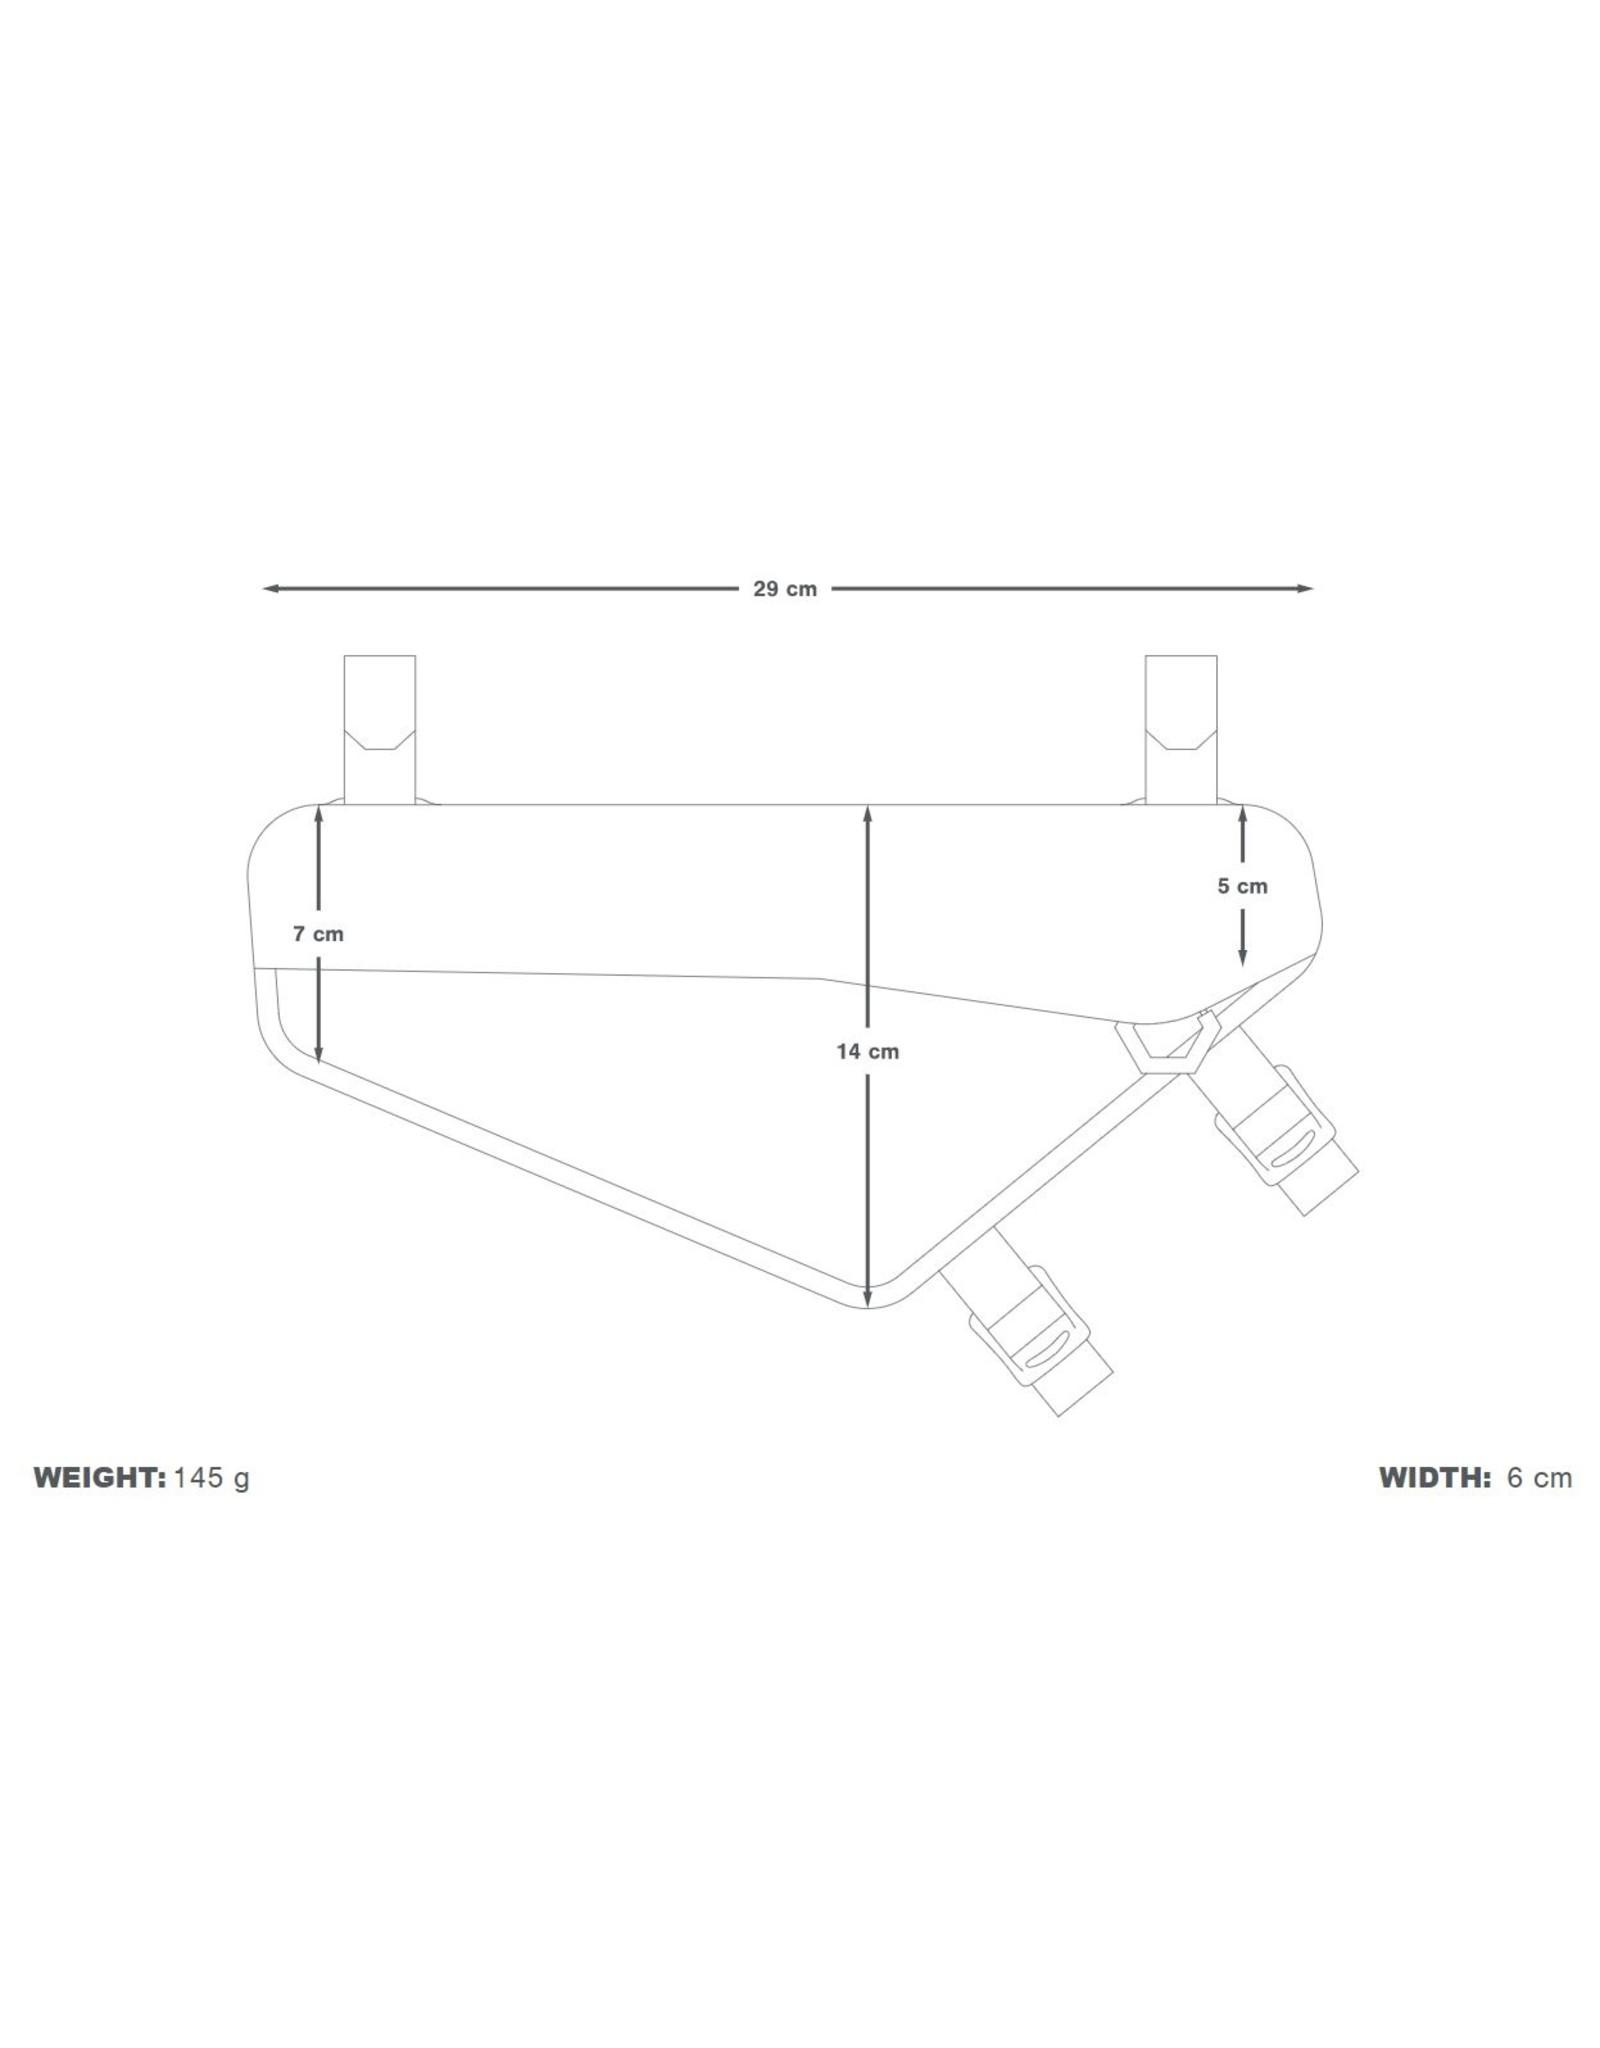 Apidura APIDURA, Racing Frame Pack, 2.4L